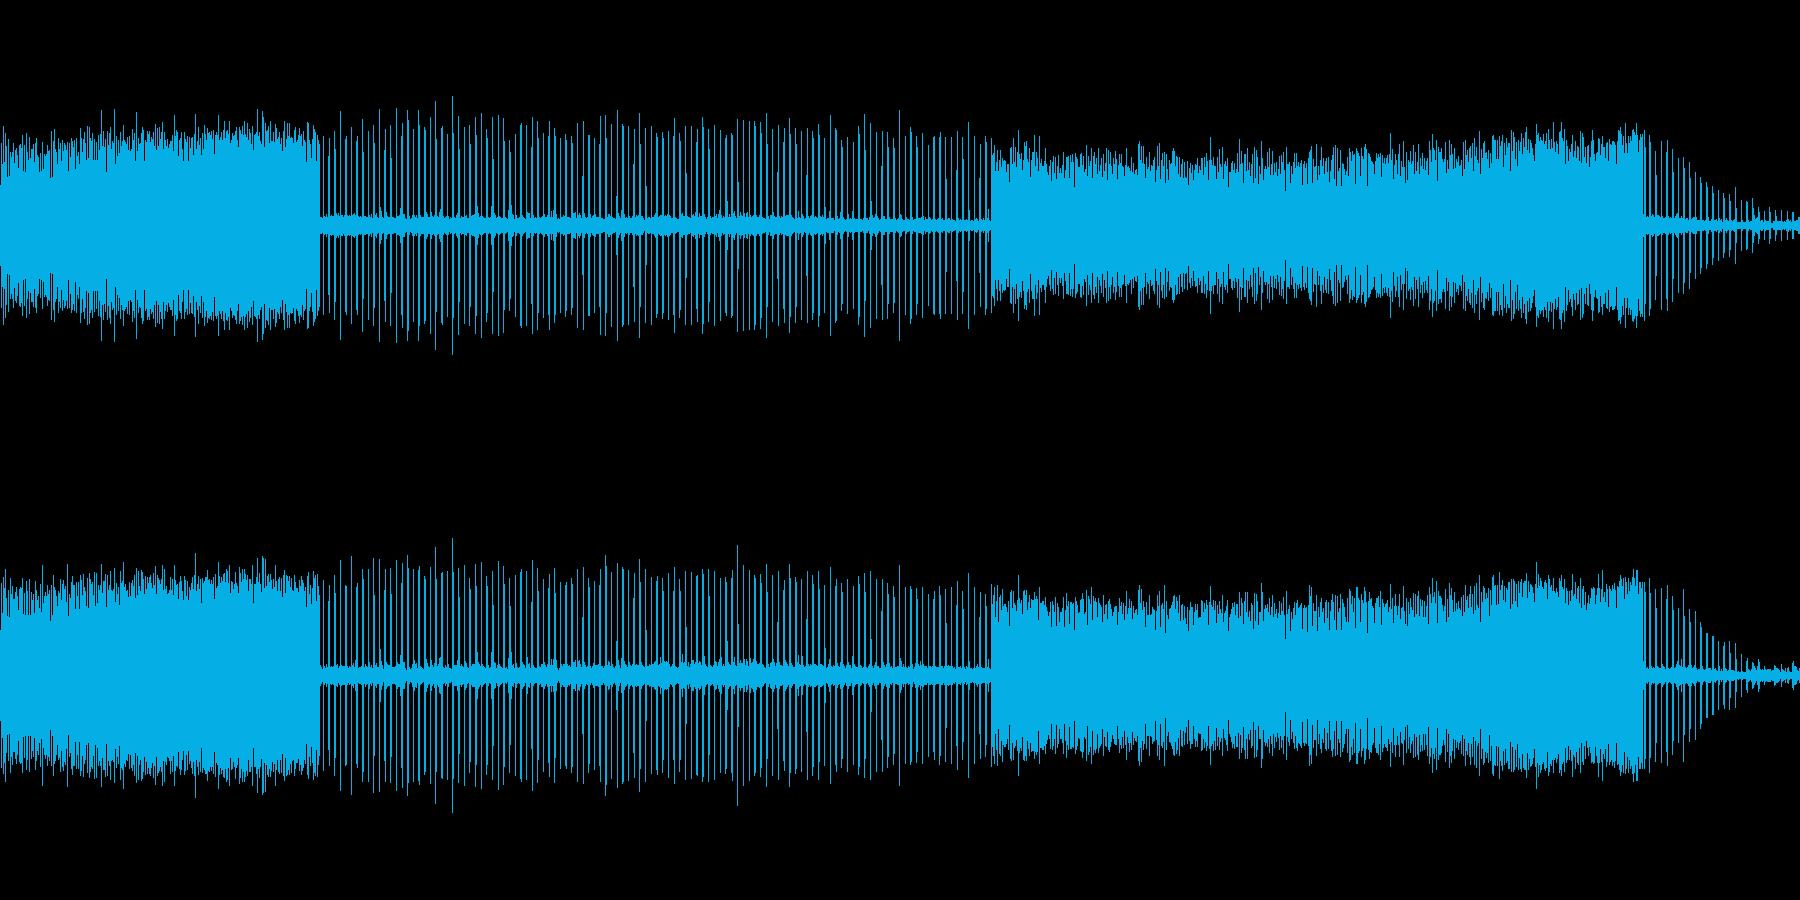 bの近くの水スプリンクラーティックの再生済みの波形